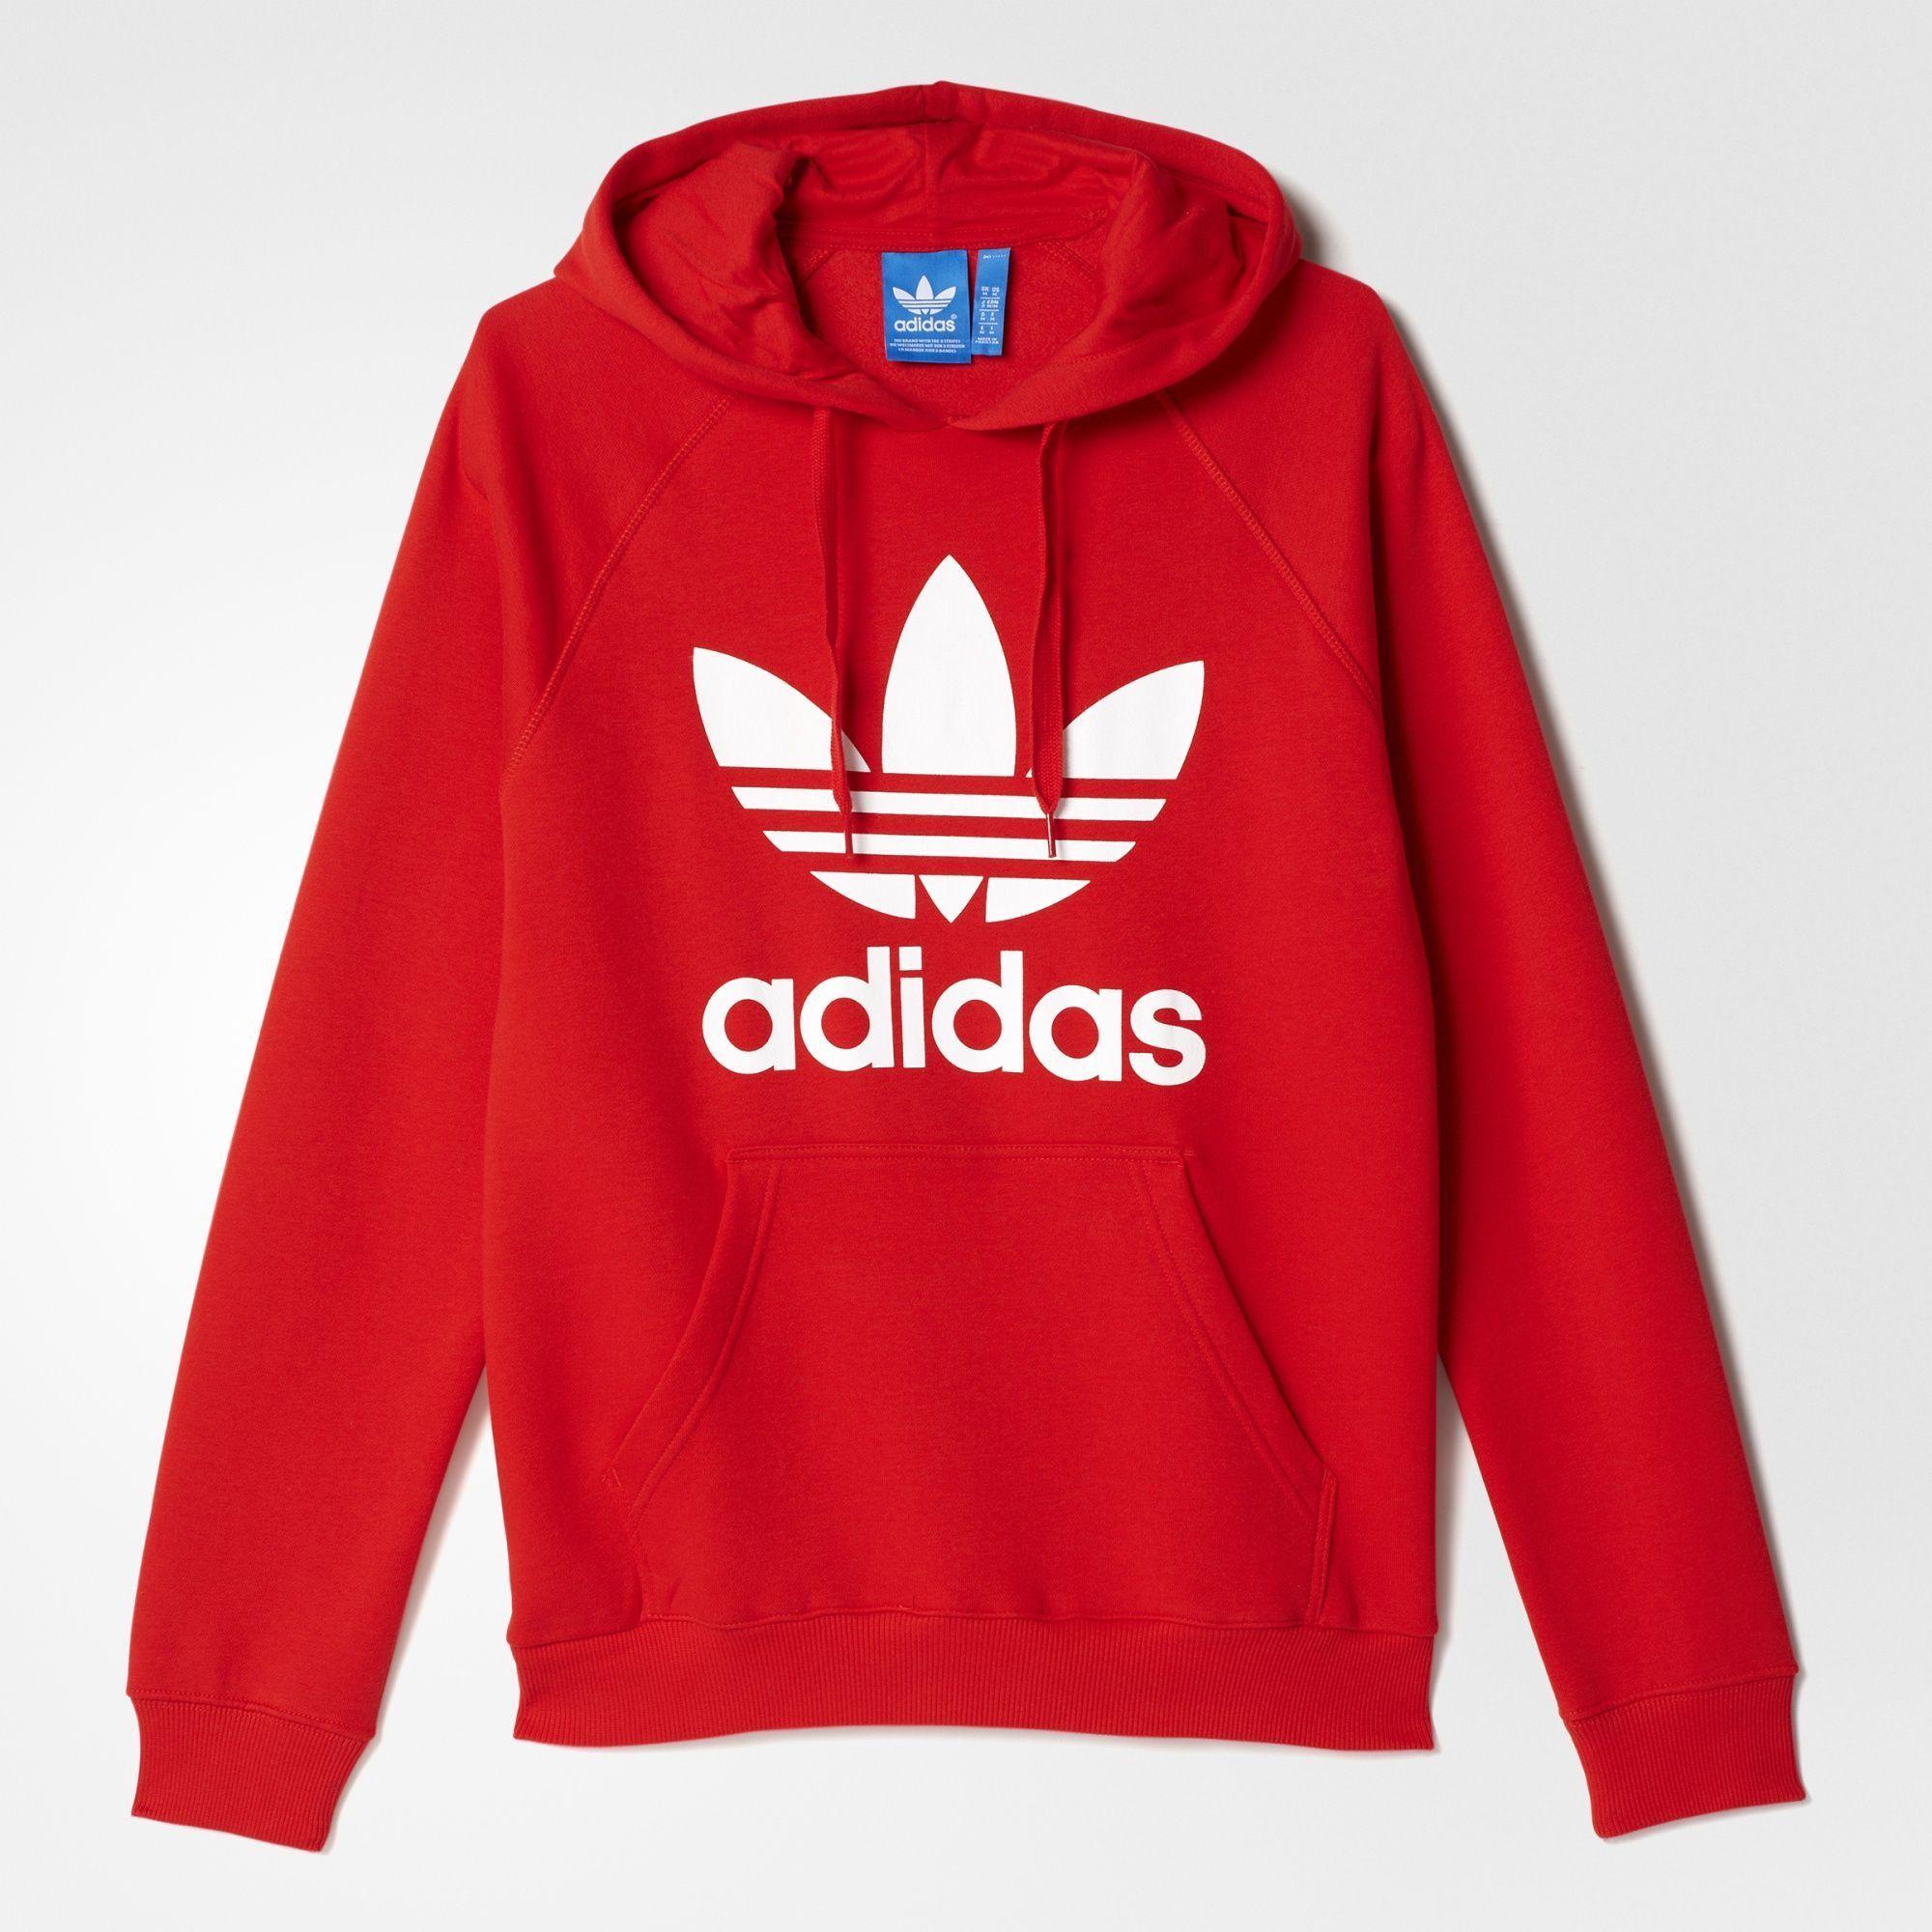 Adidas Originals Men S Trefoil Hoodie Adidas Sweatshirt Red Adidas Hoodie Adidas Outfit